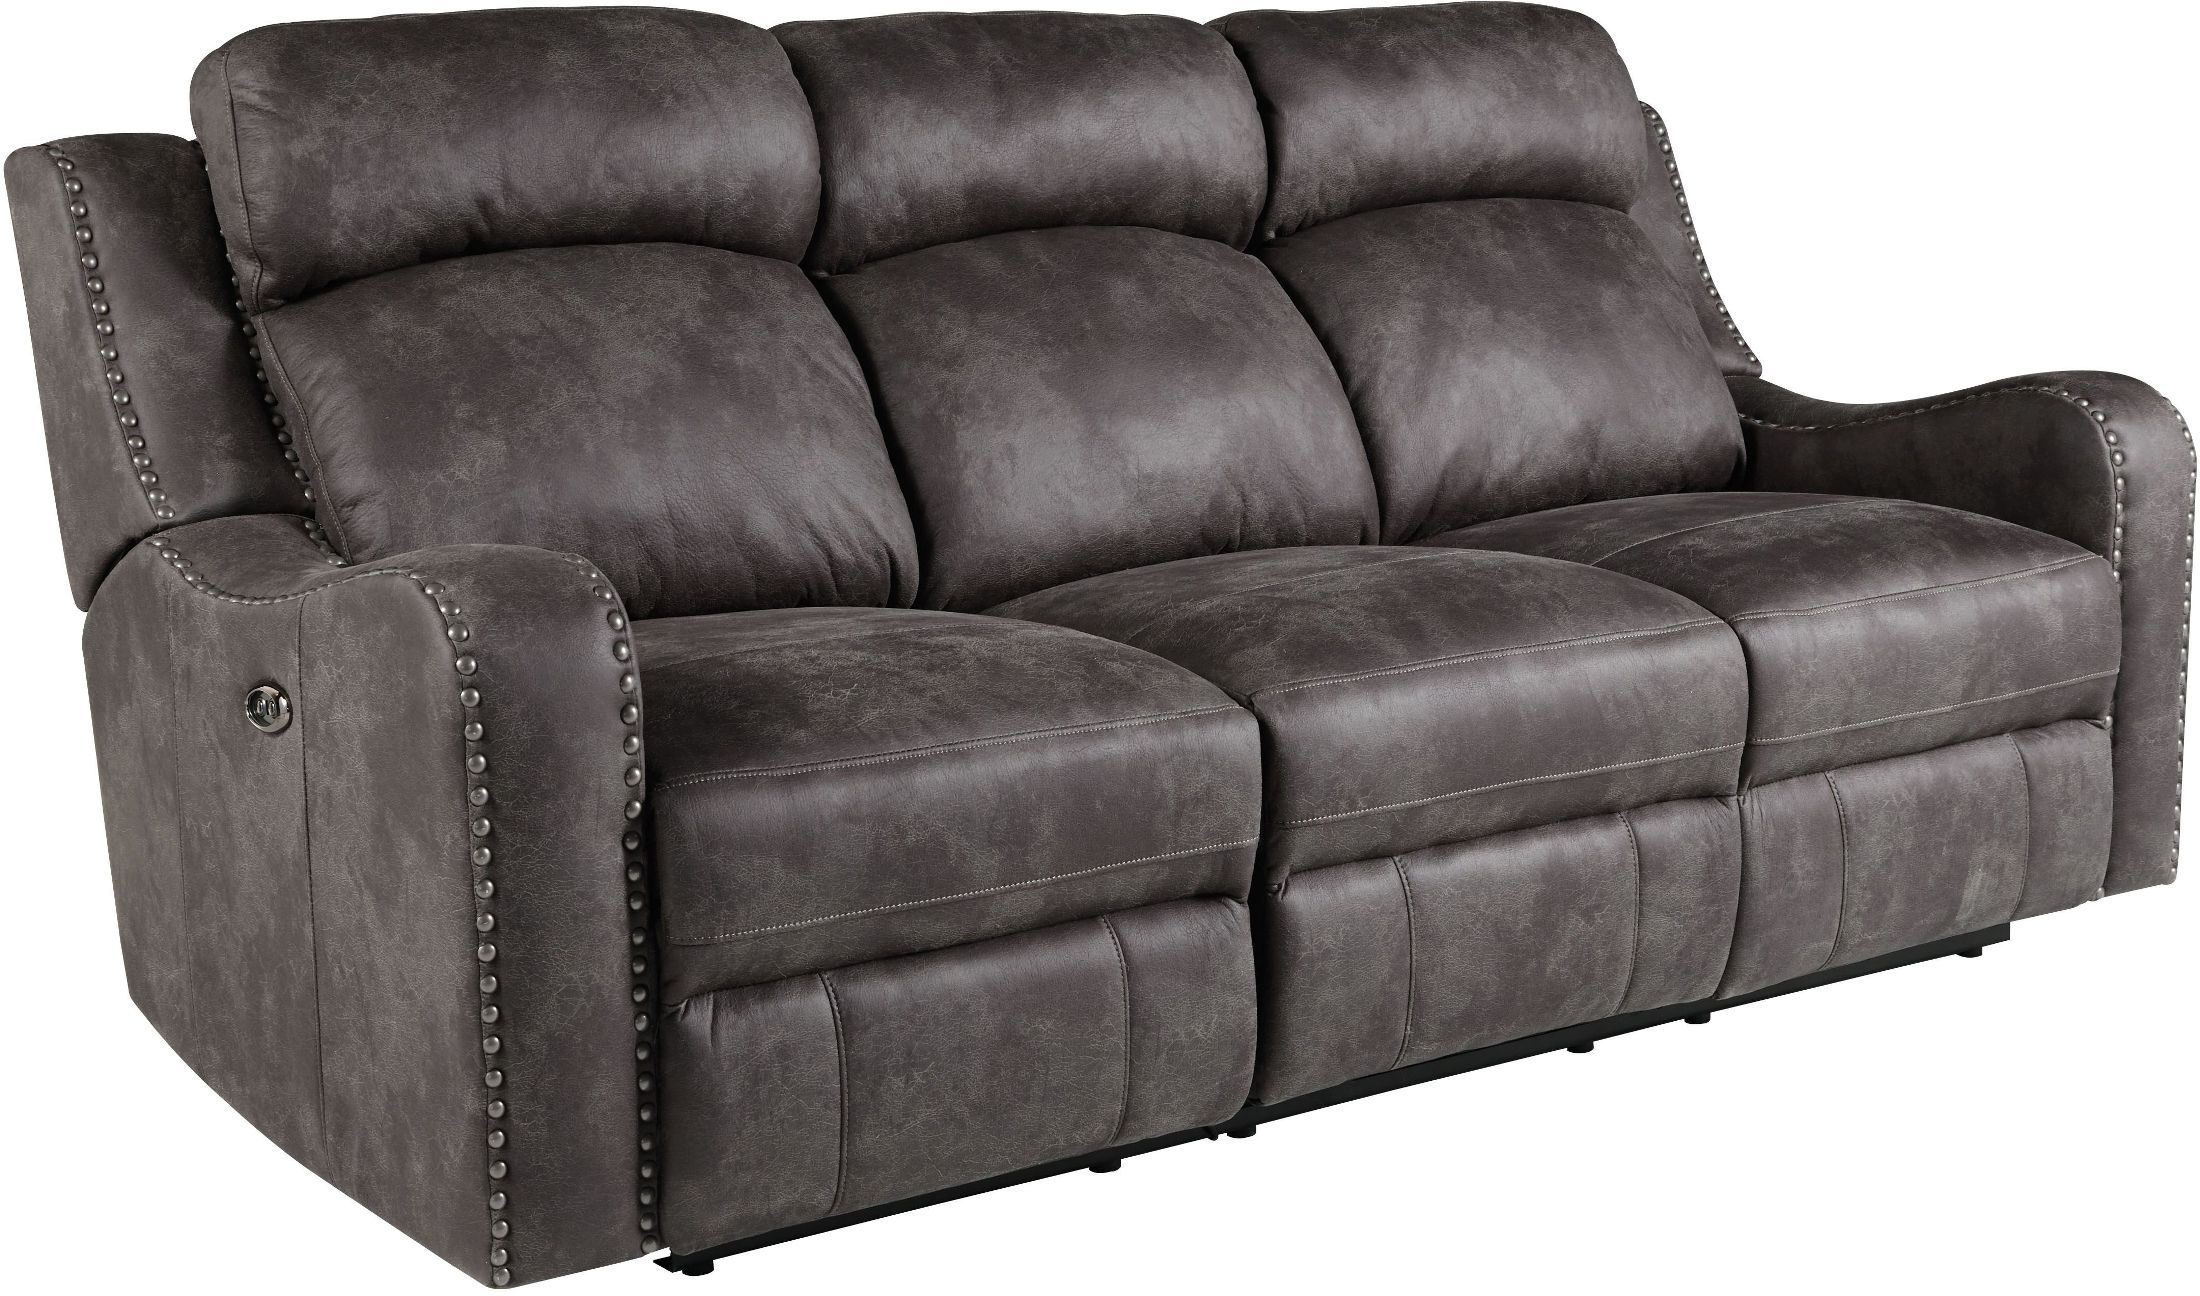 Bankston Gray Reclining Sofa Leather Reclining Sofa Standard Furniture Power Reclining Loveseat